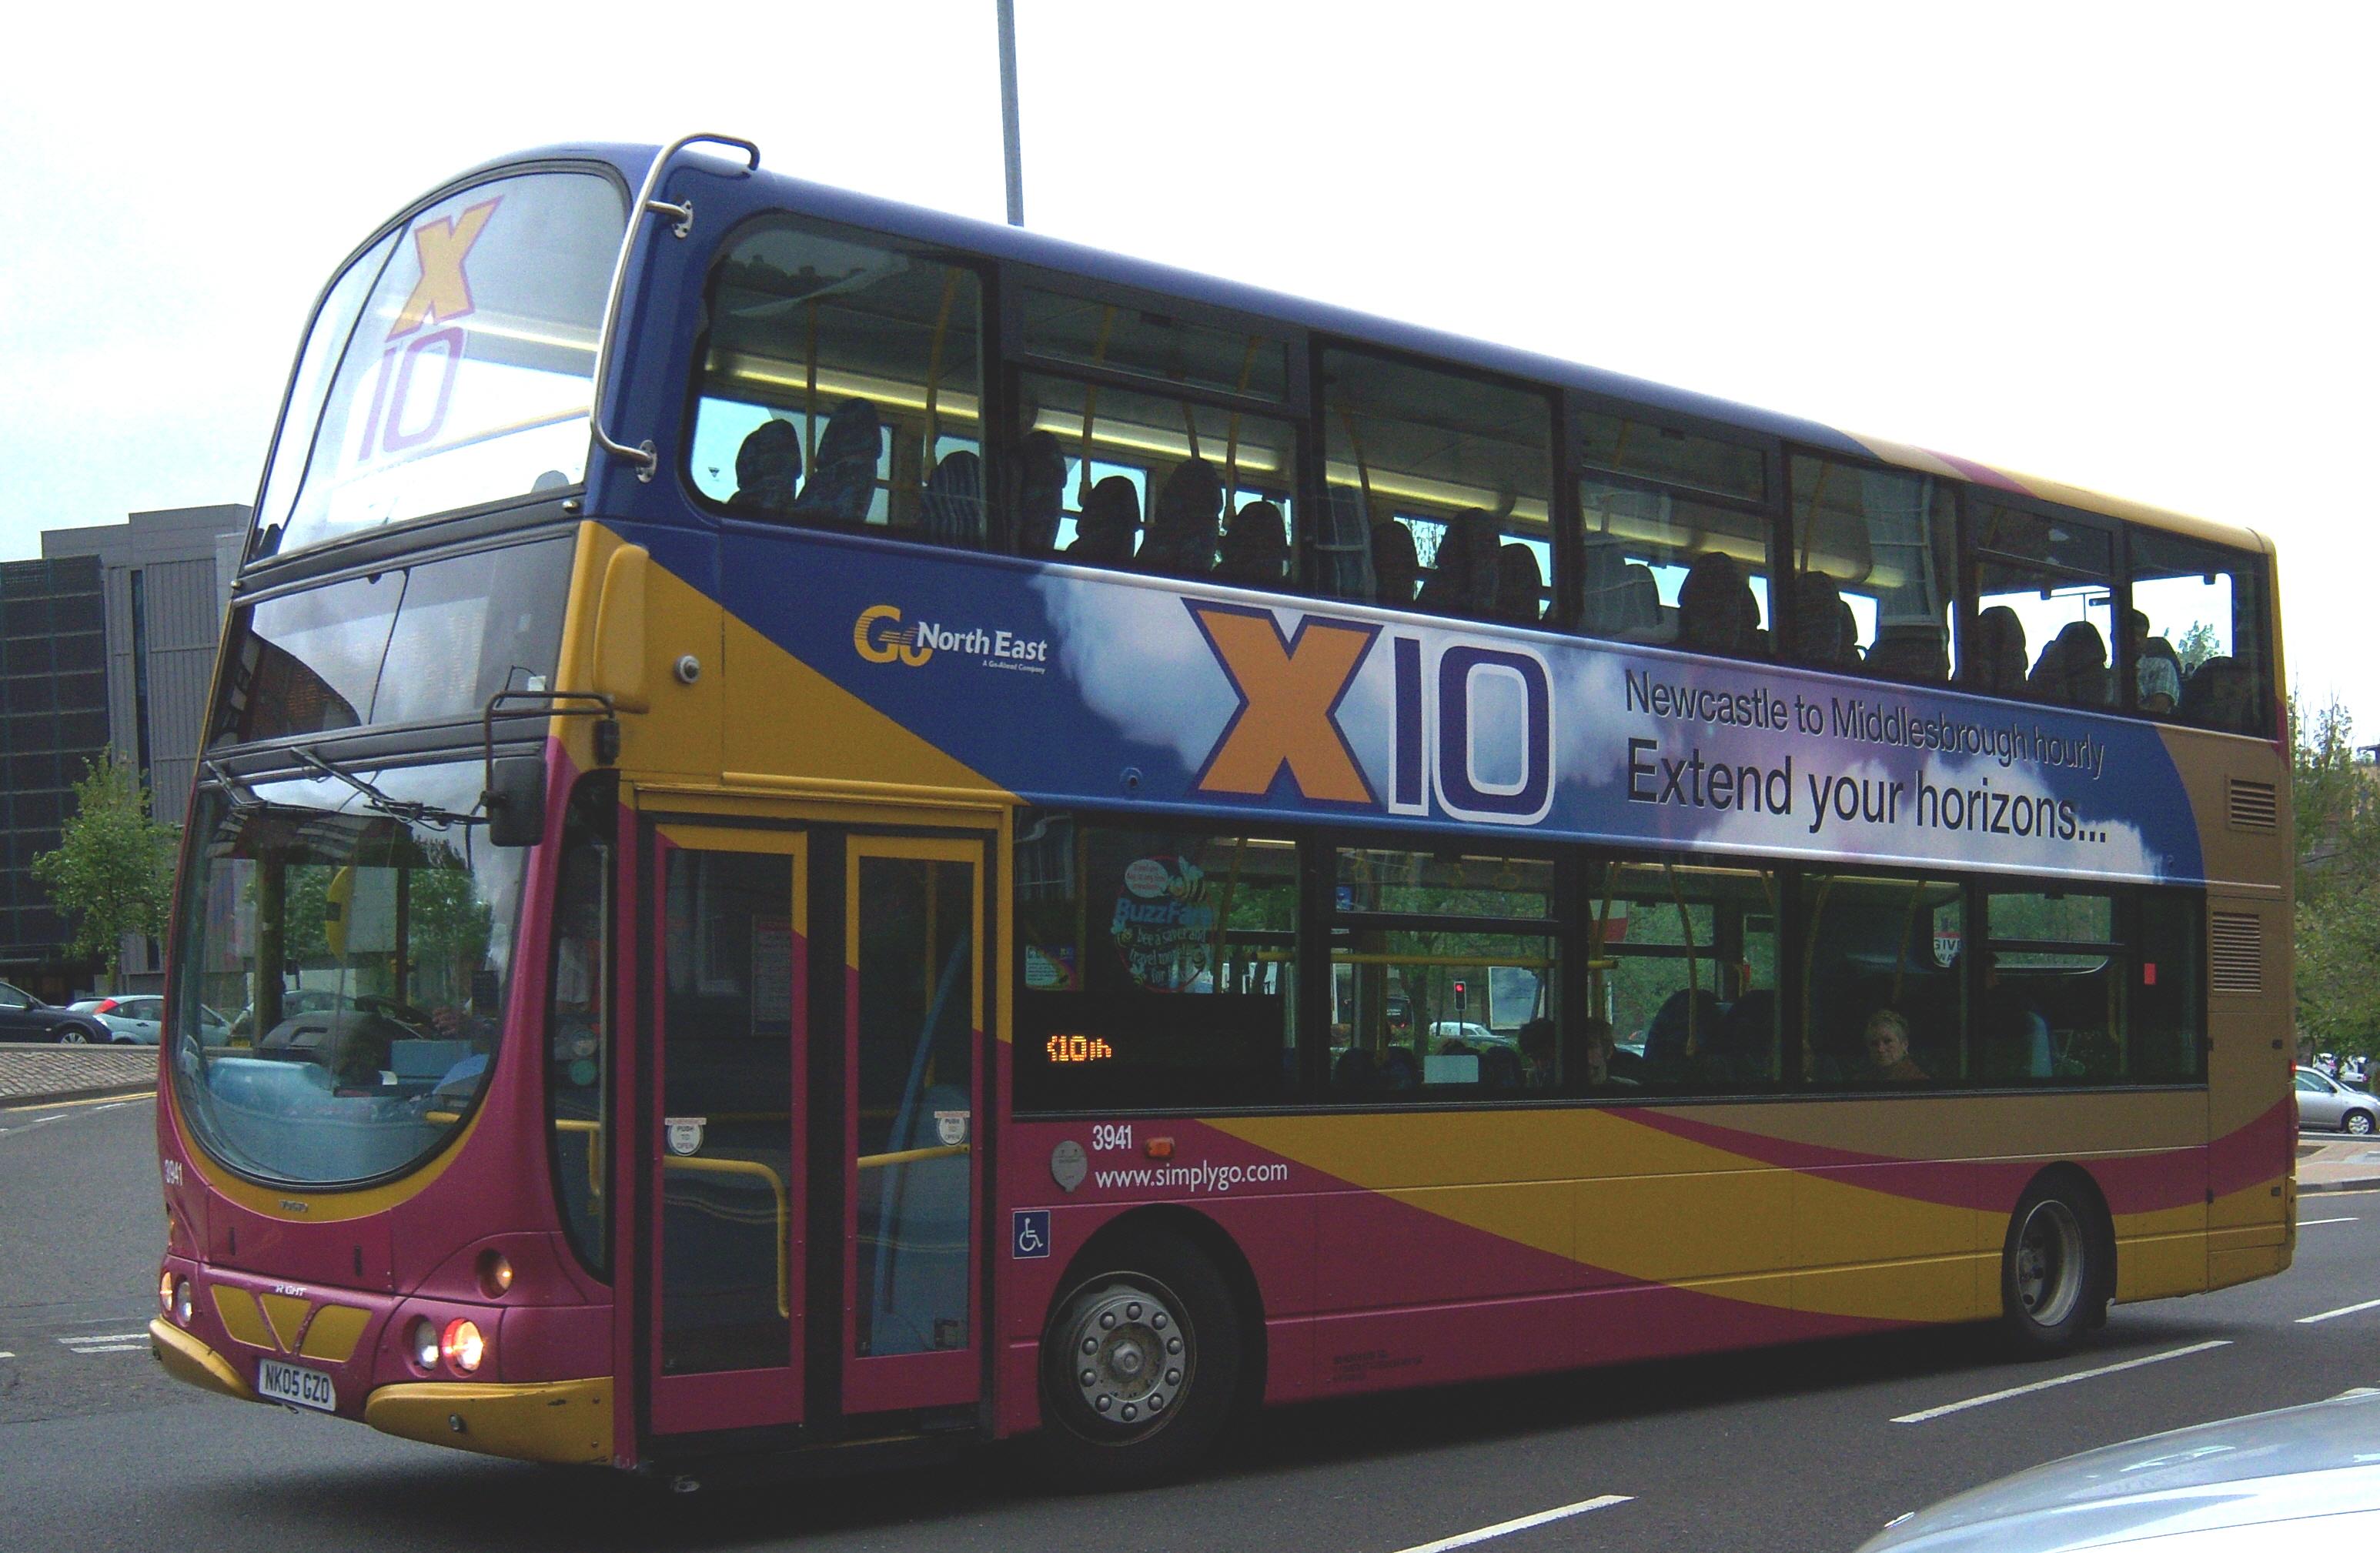 File:Go North East bus 3941 Volvo B7TL Wrightbus Eclipse Gemini NK05 GZO X10 livery